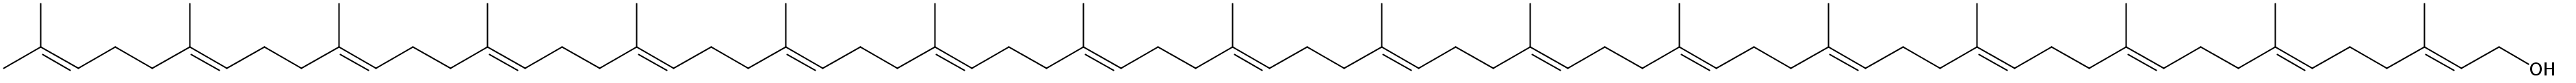 Structural formula of Heptadecaprenol